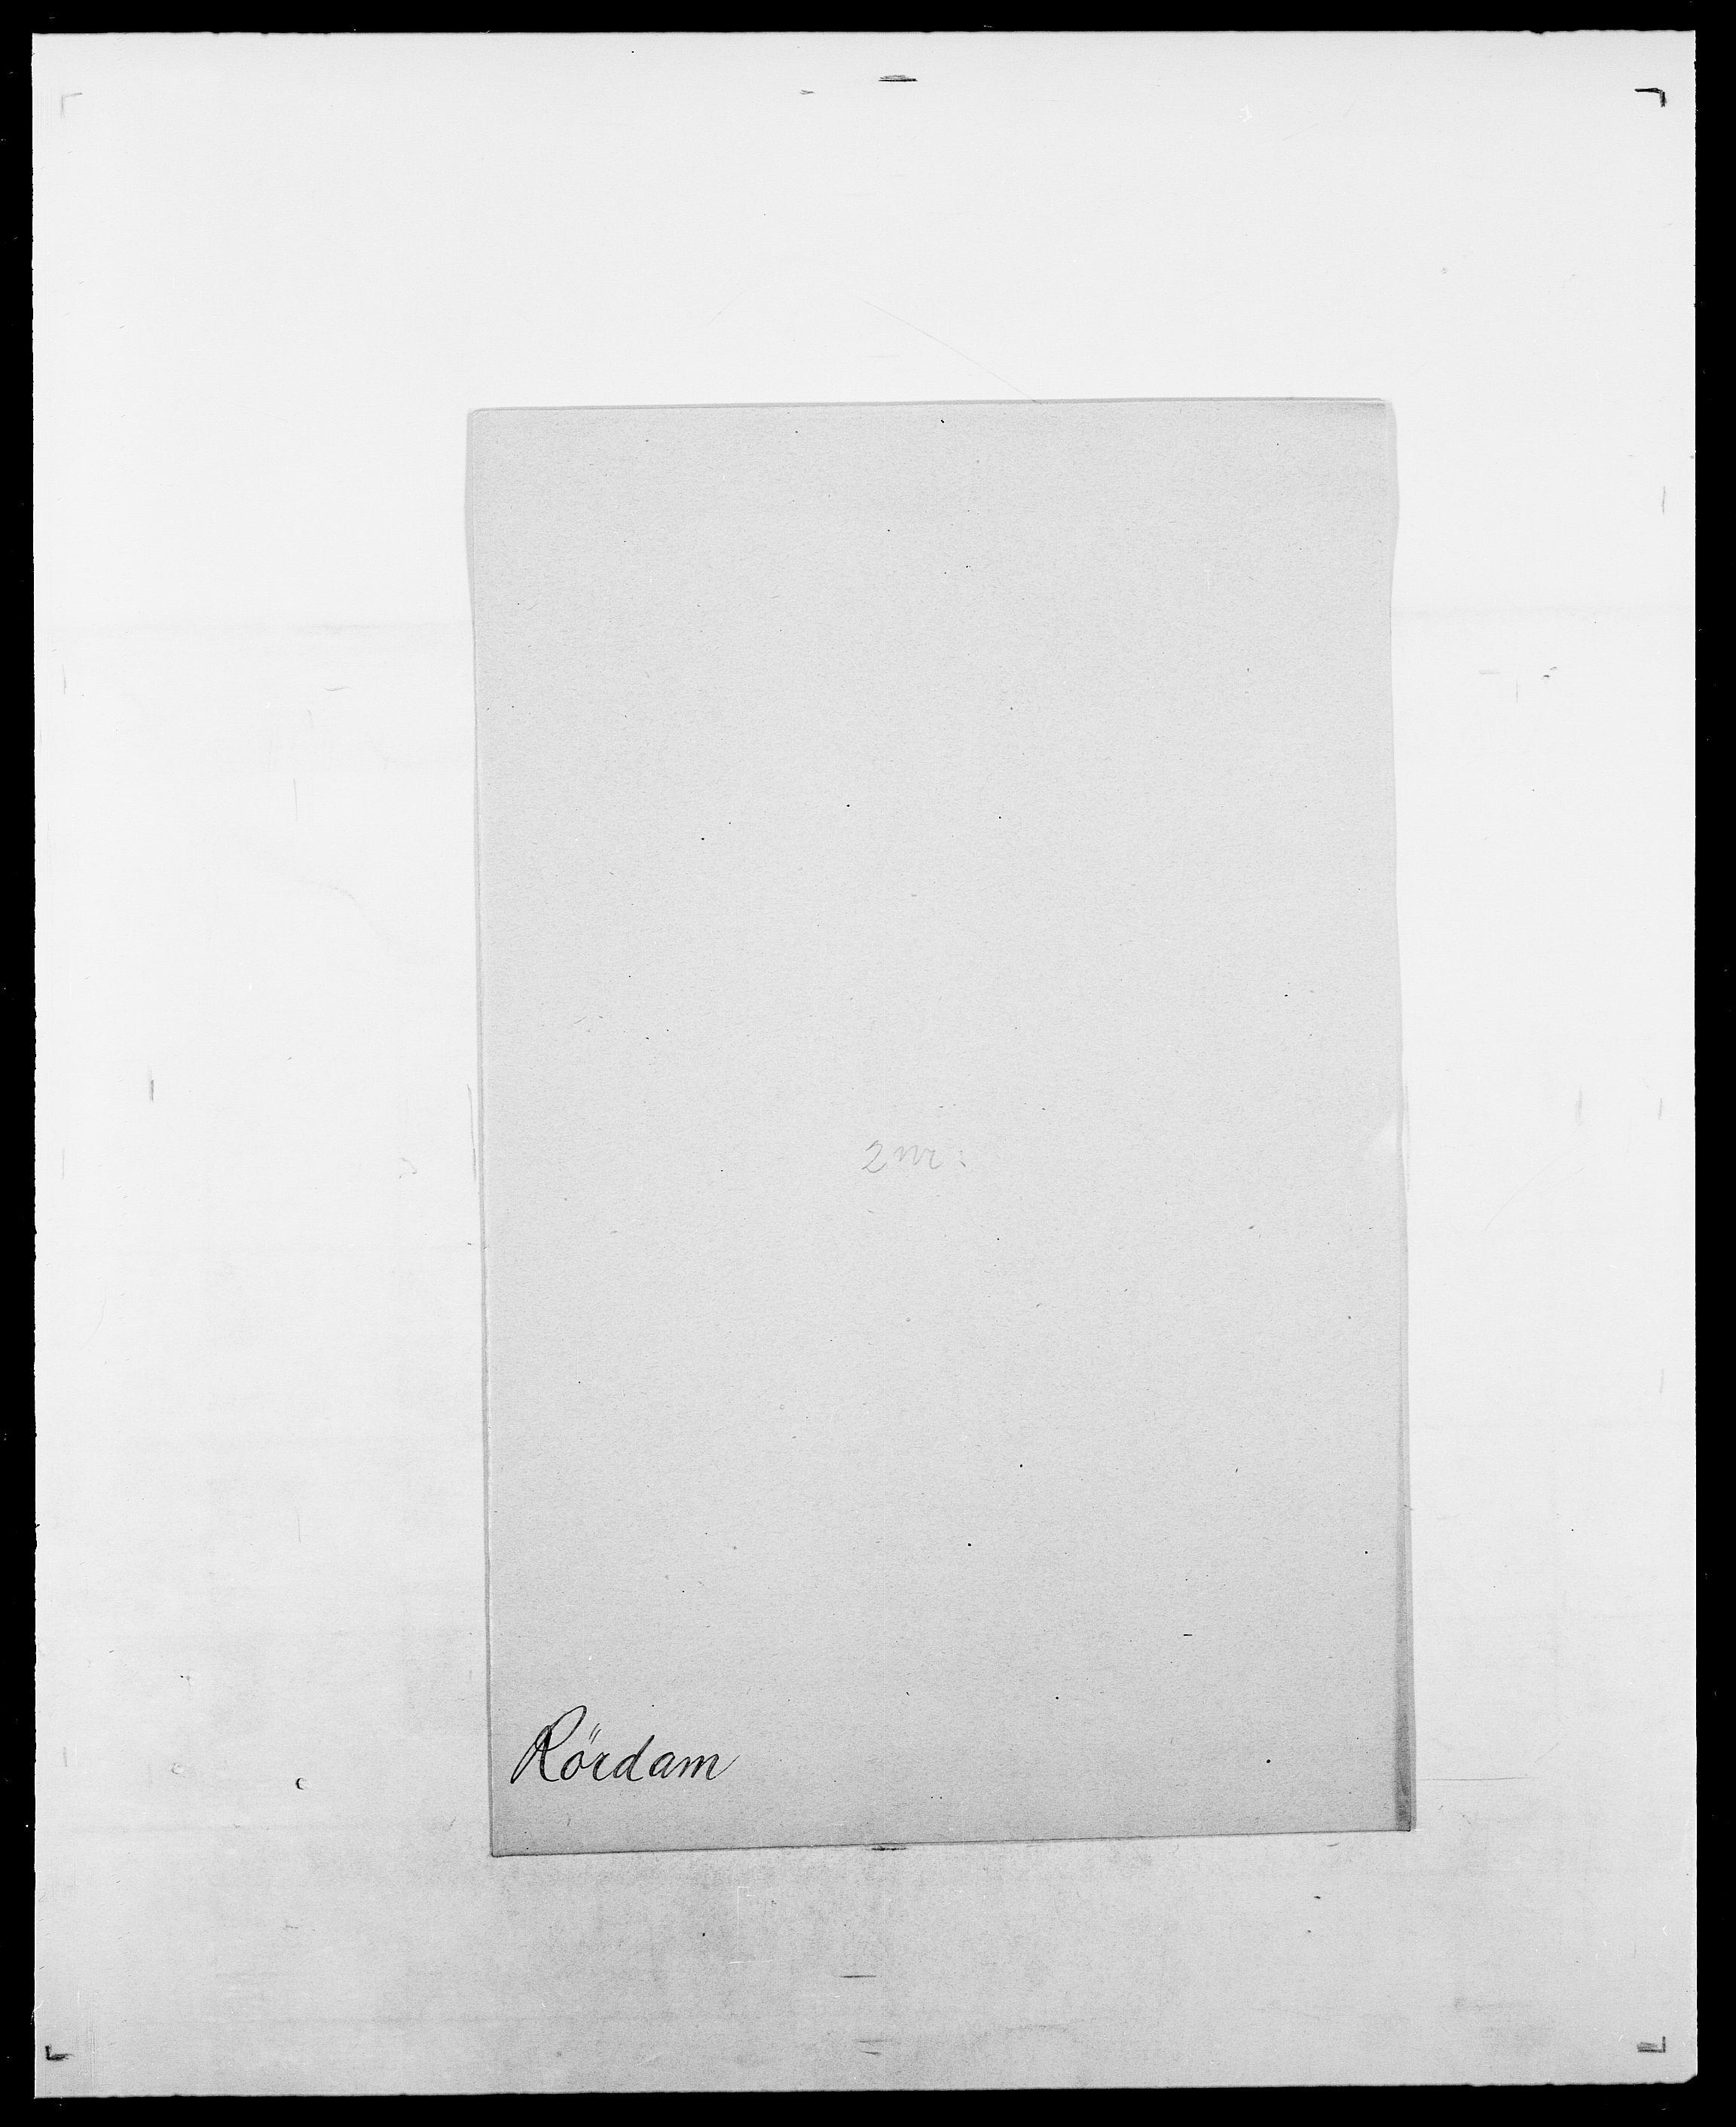 SAO, Delgobe, Charles Antoine - samling, D/Da/L0033: Roald - Røyem, s. 800